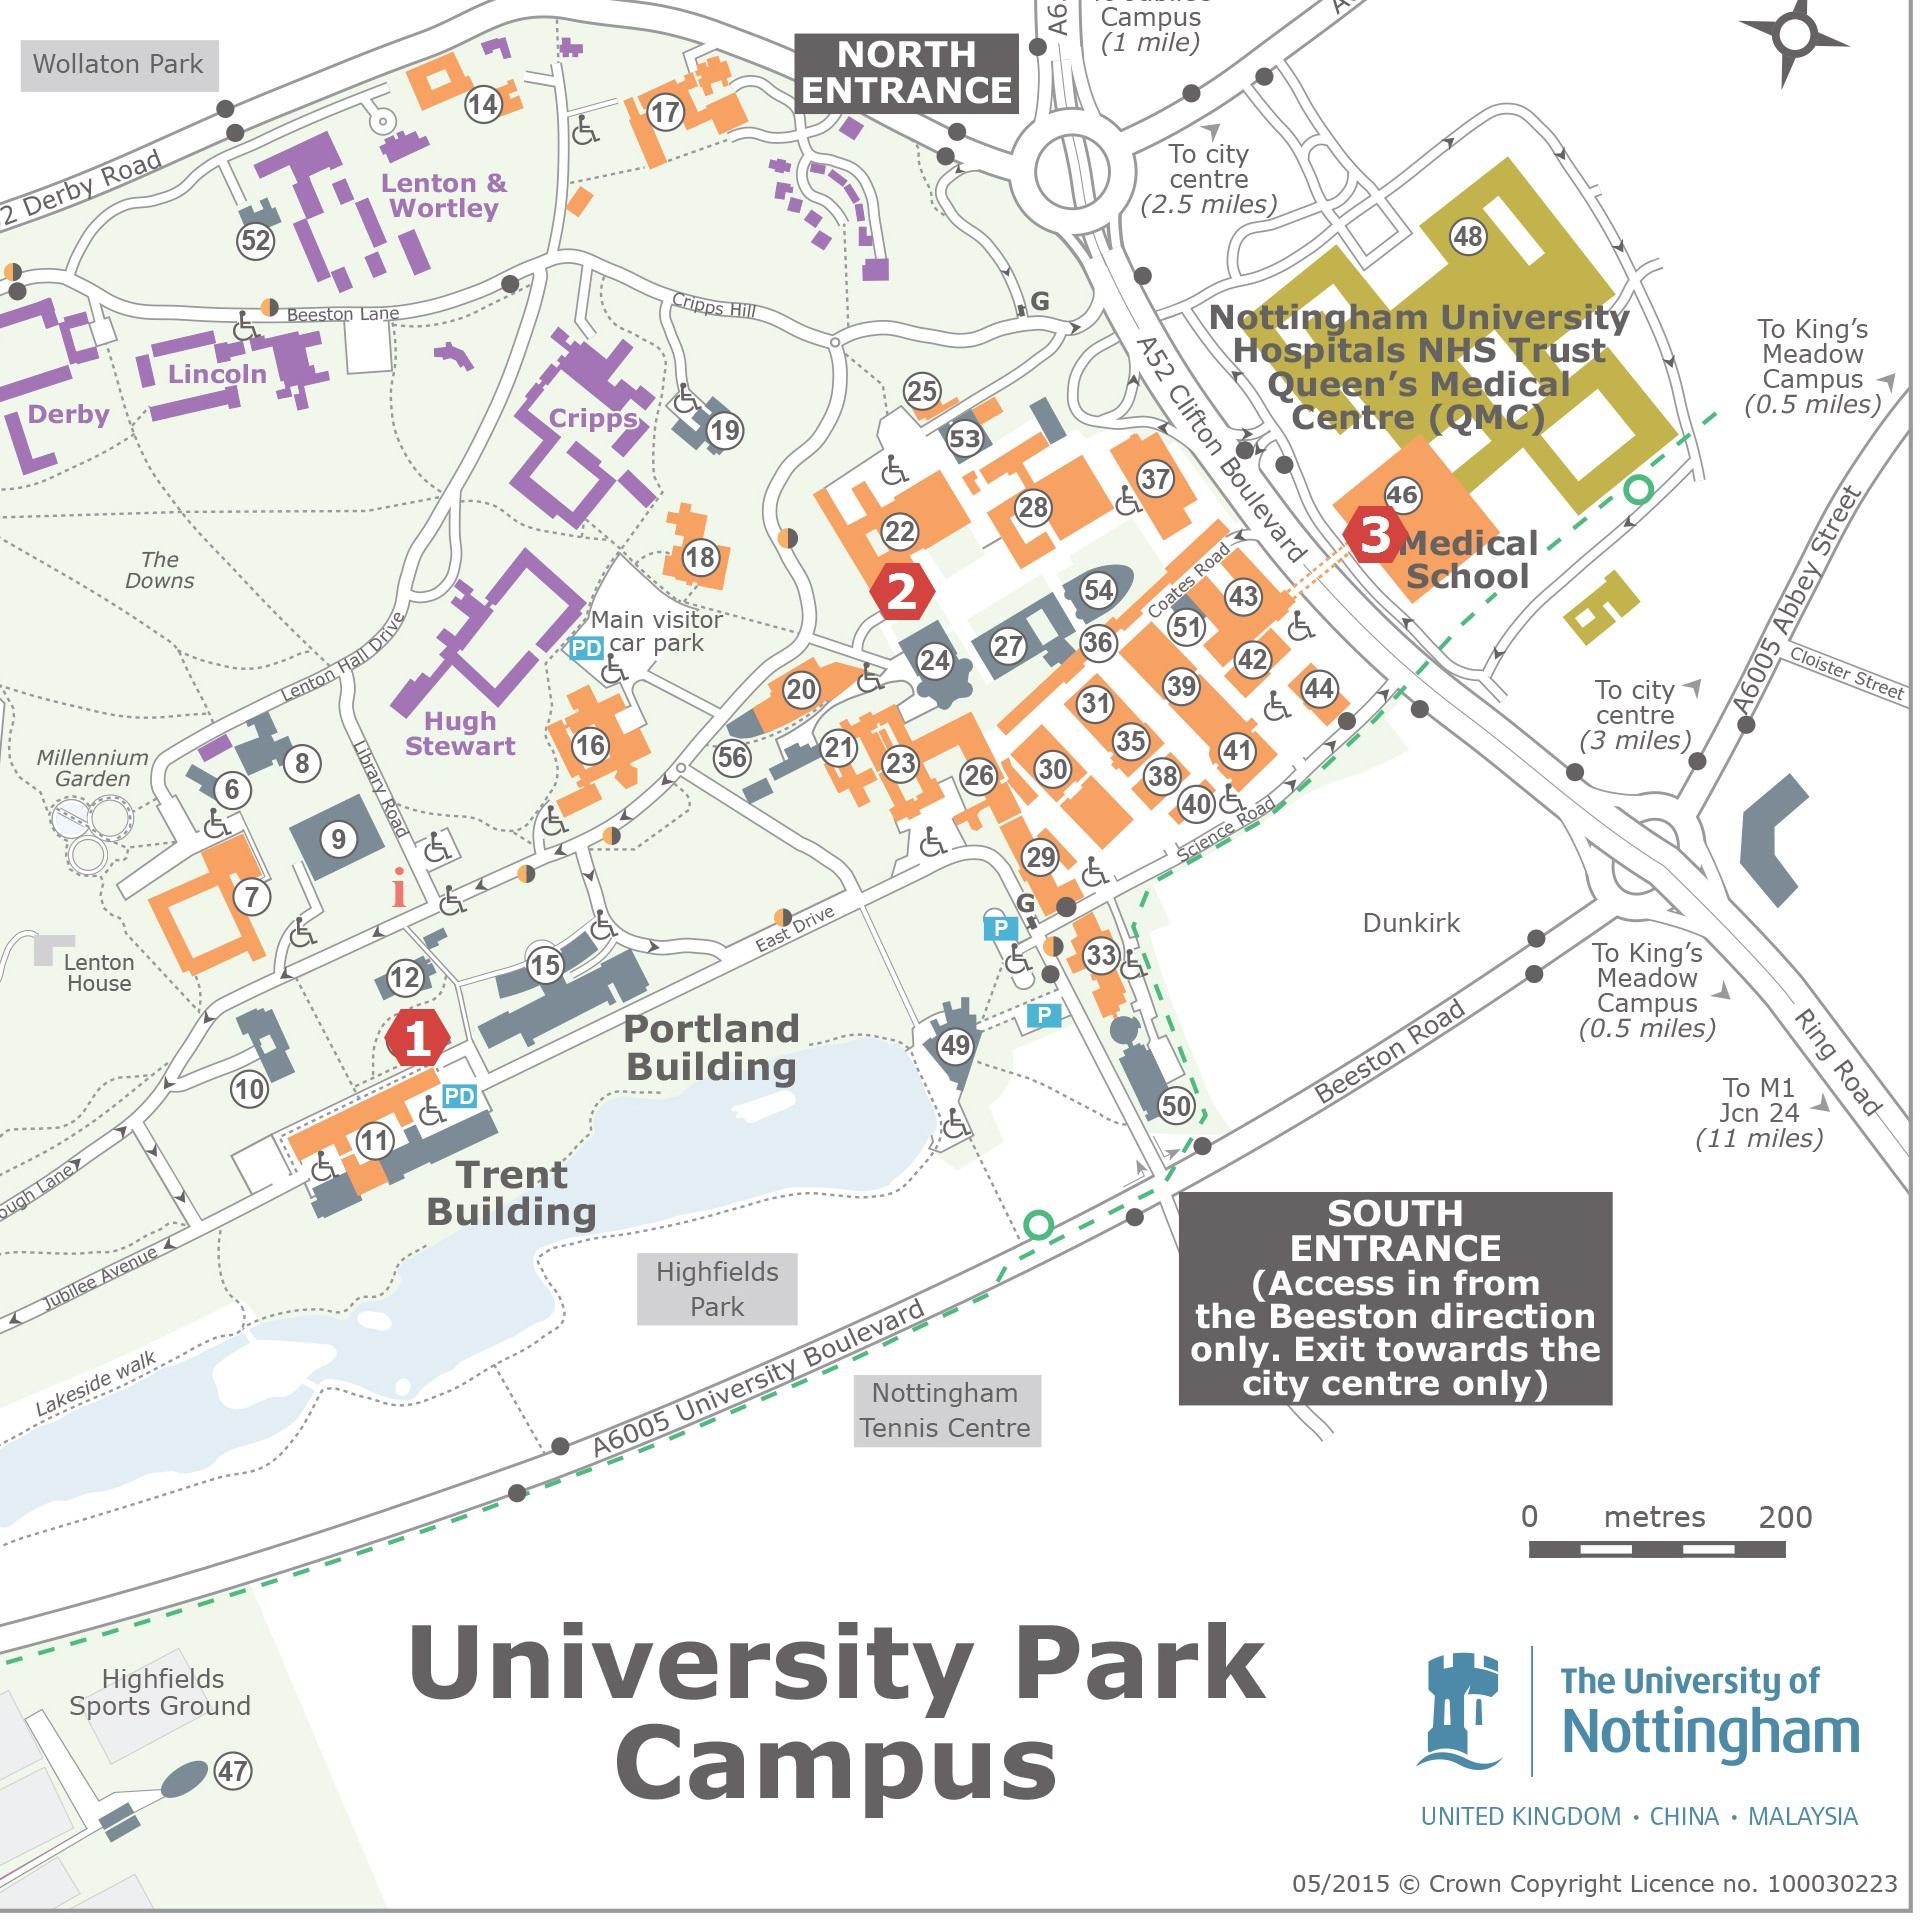 University Park Penn State Map.University Park Map Rtlbreakfastclub